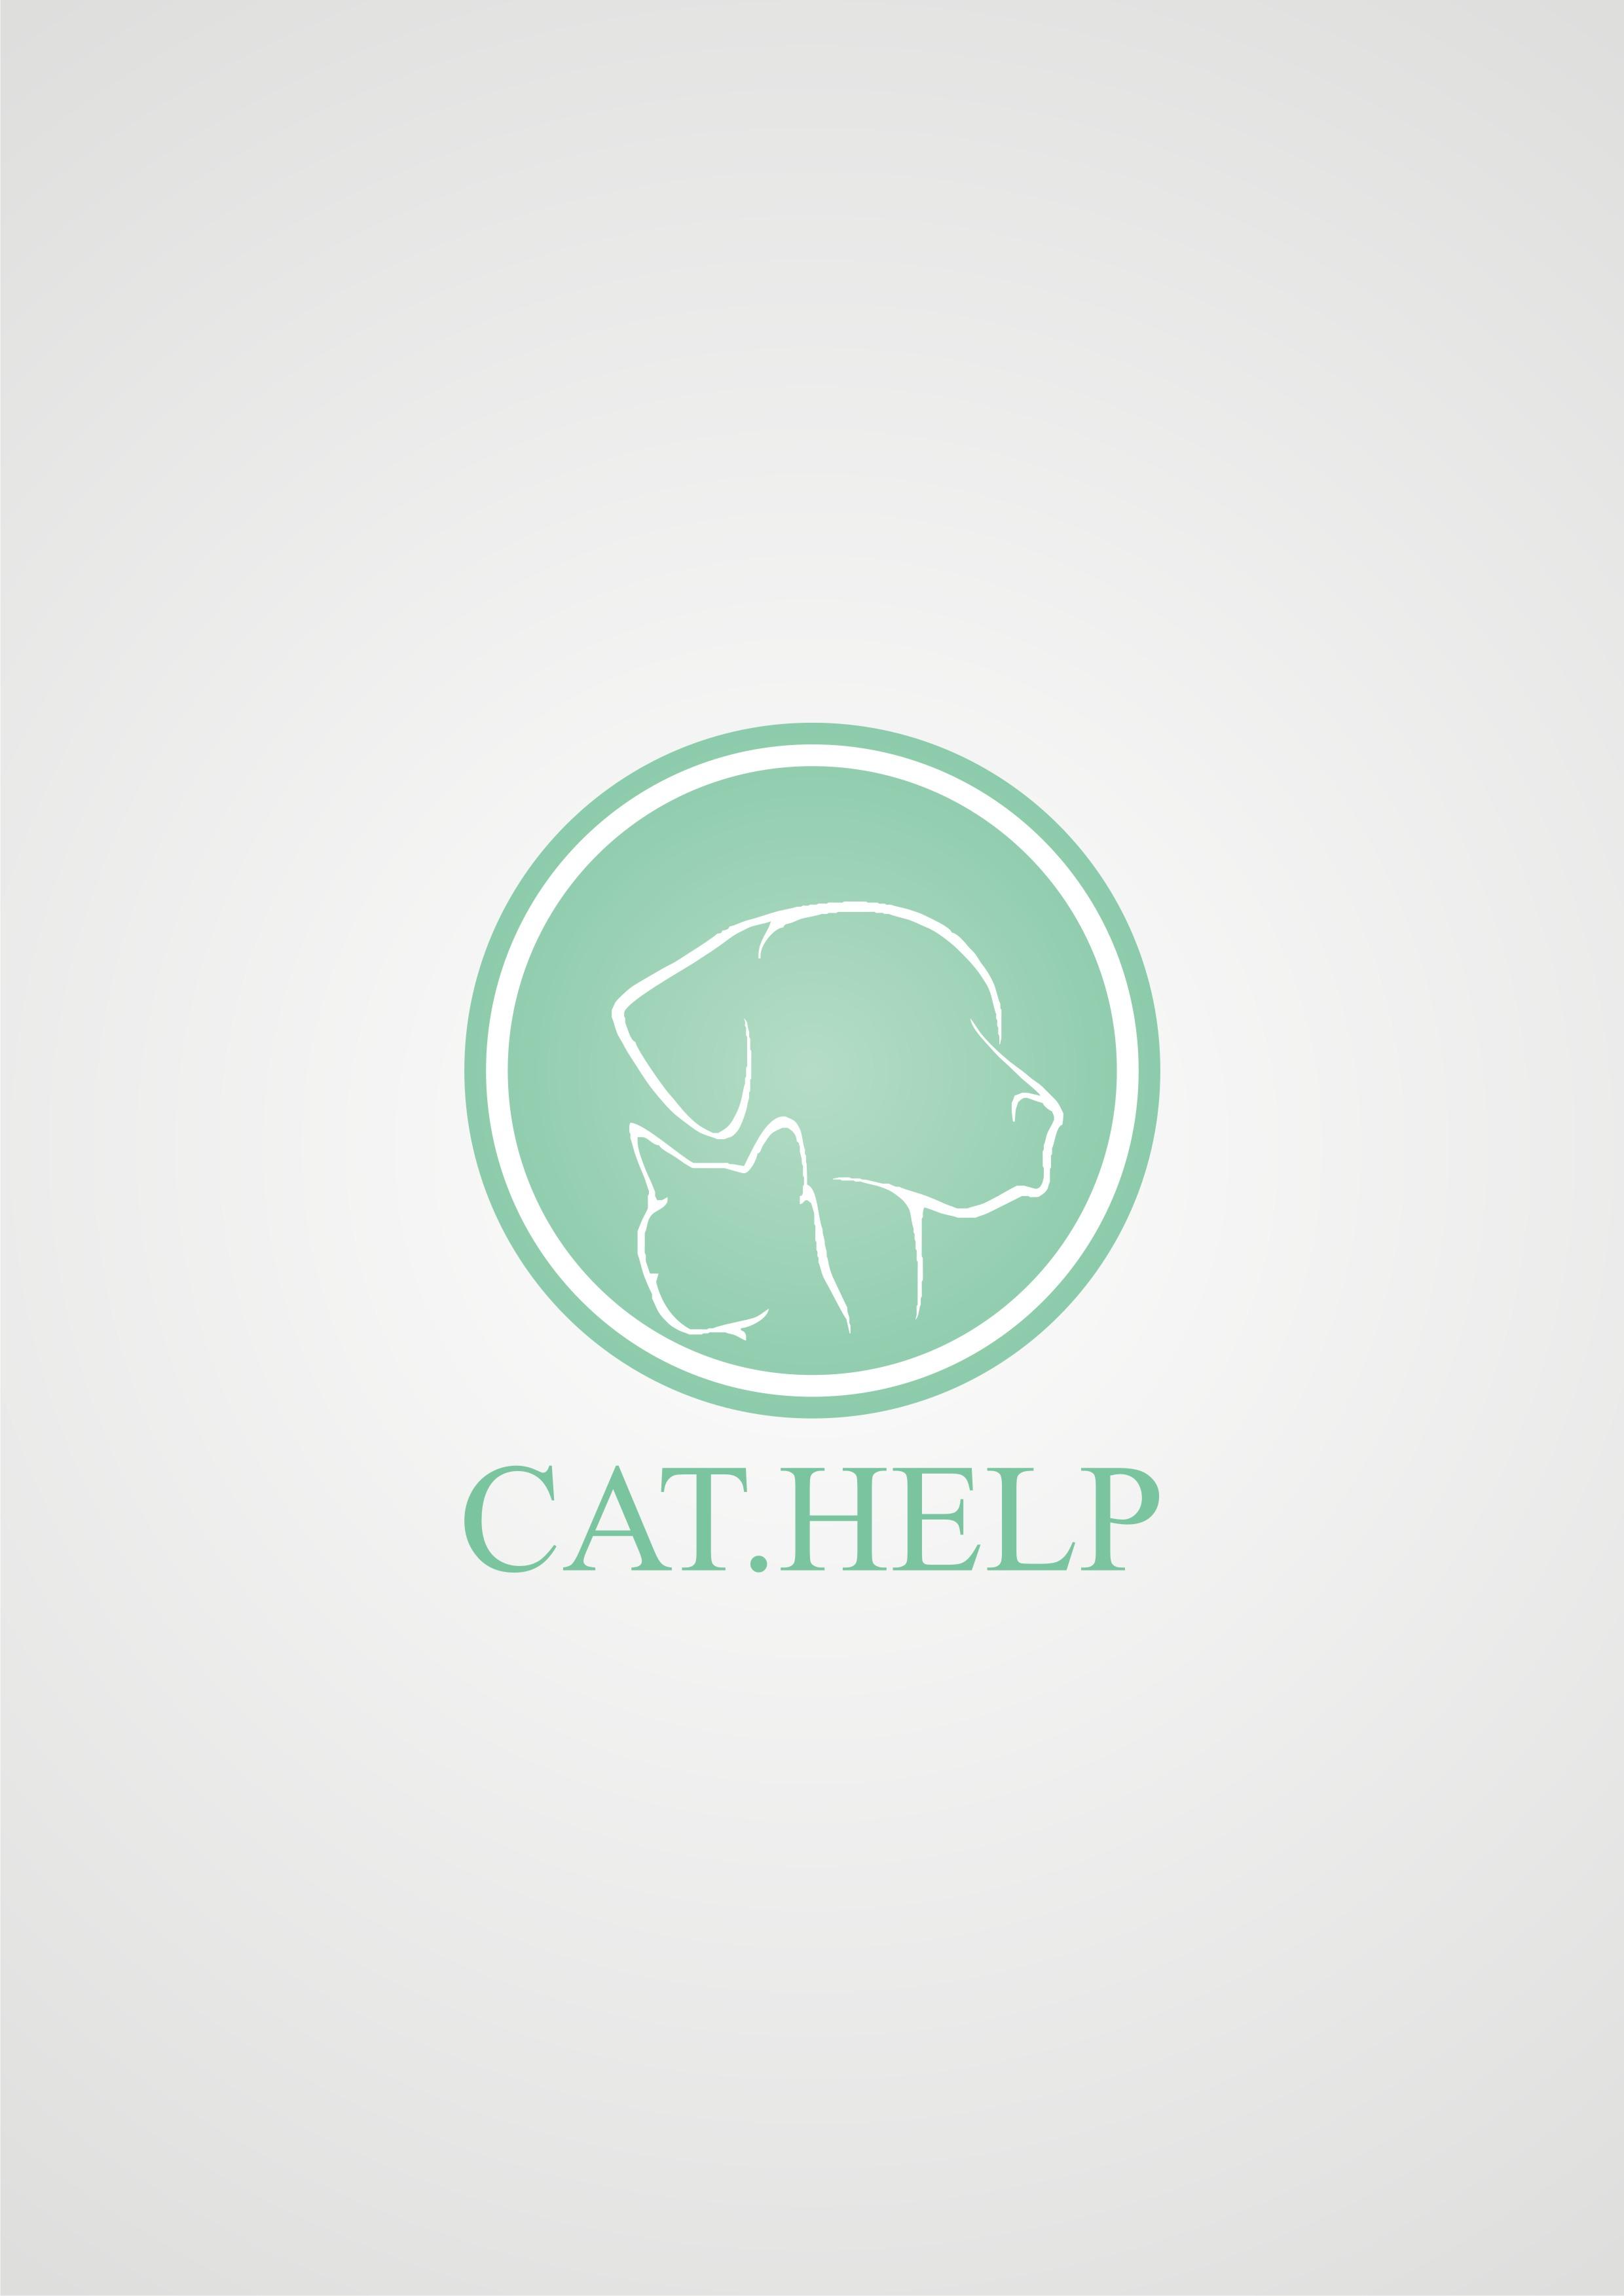 логотип для сайта и группы вк - cat.help фото f_08359dd91f3a5955.jpg